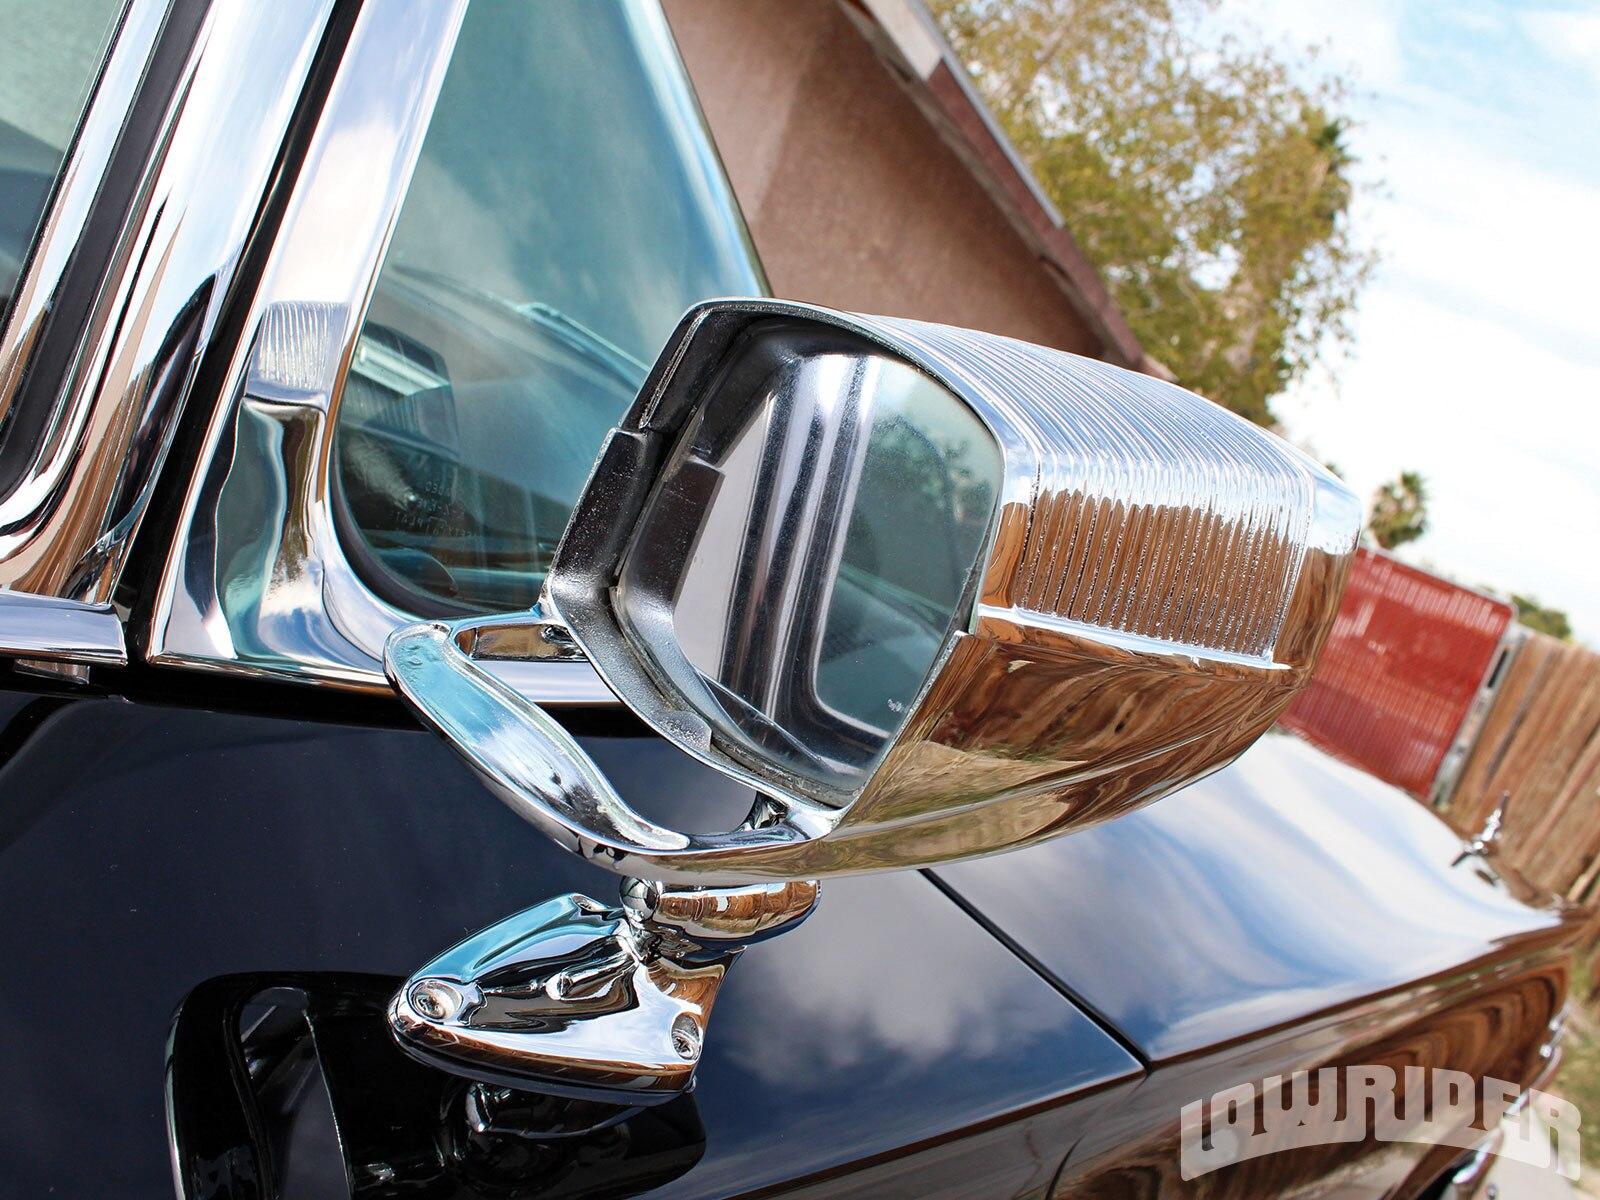 12|18 & 1960 Chevrolet Impala Convertible - Lowrider Magazine azcodes.com